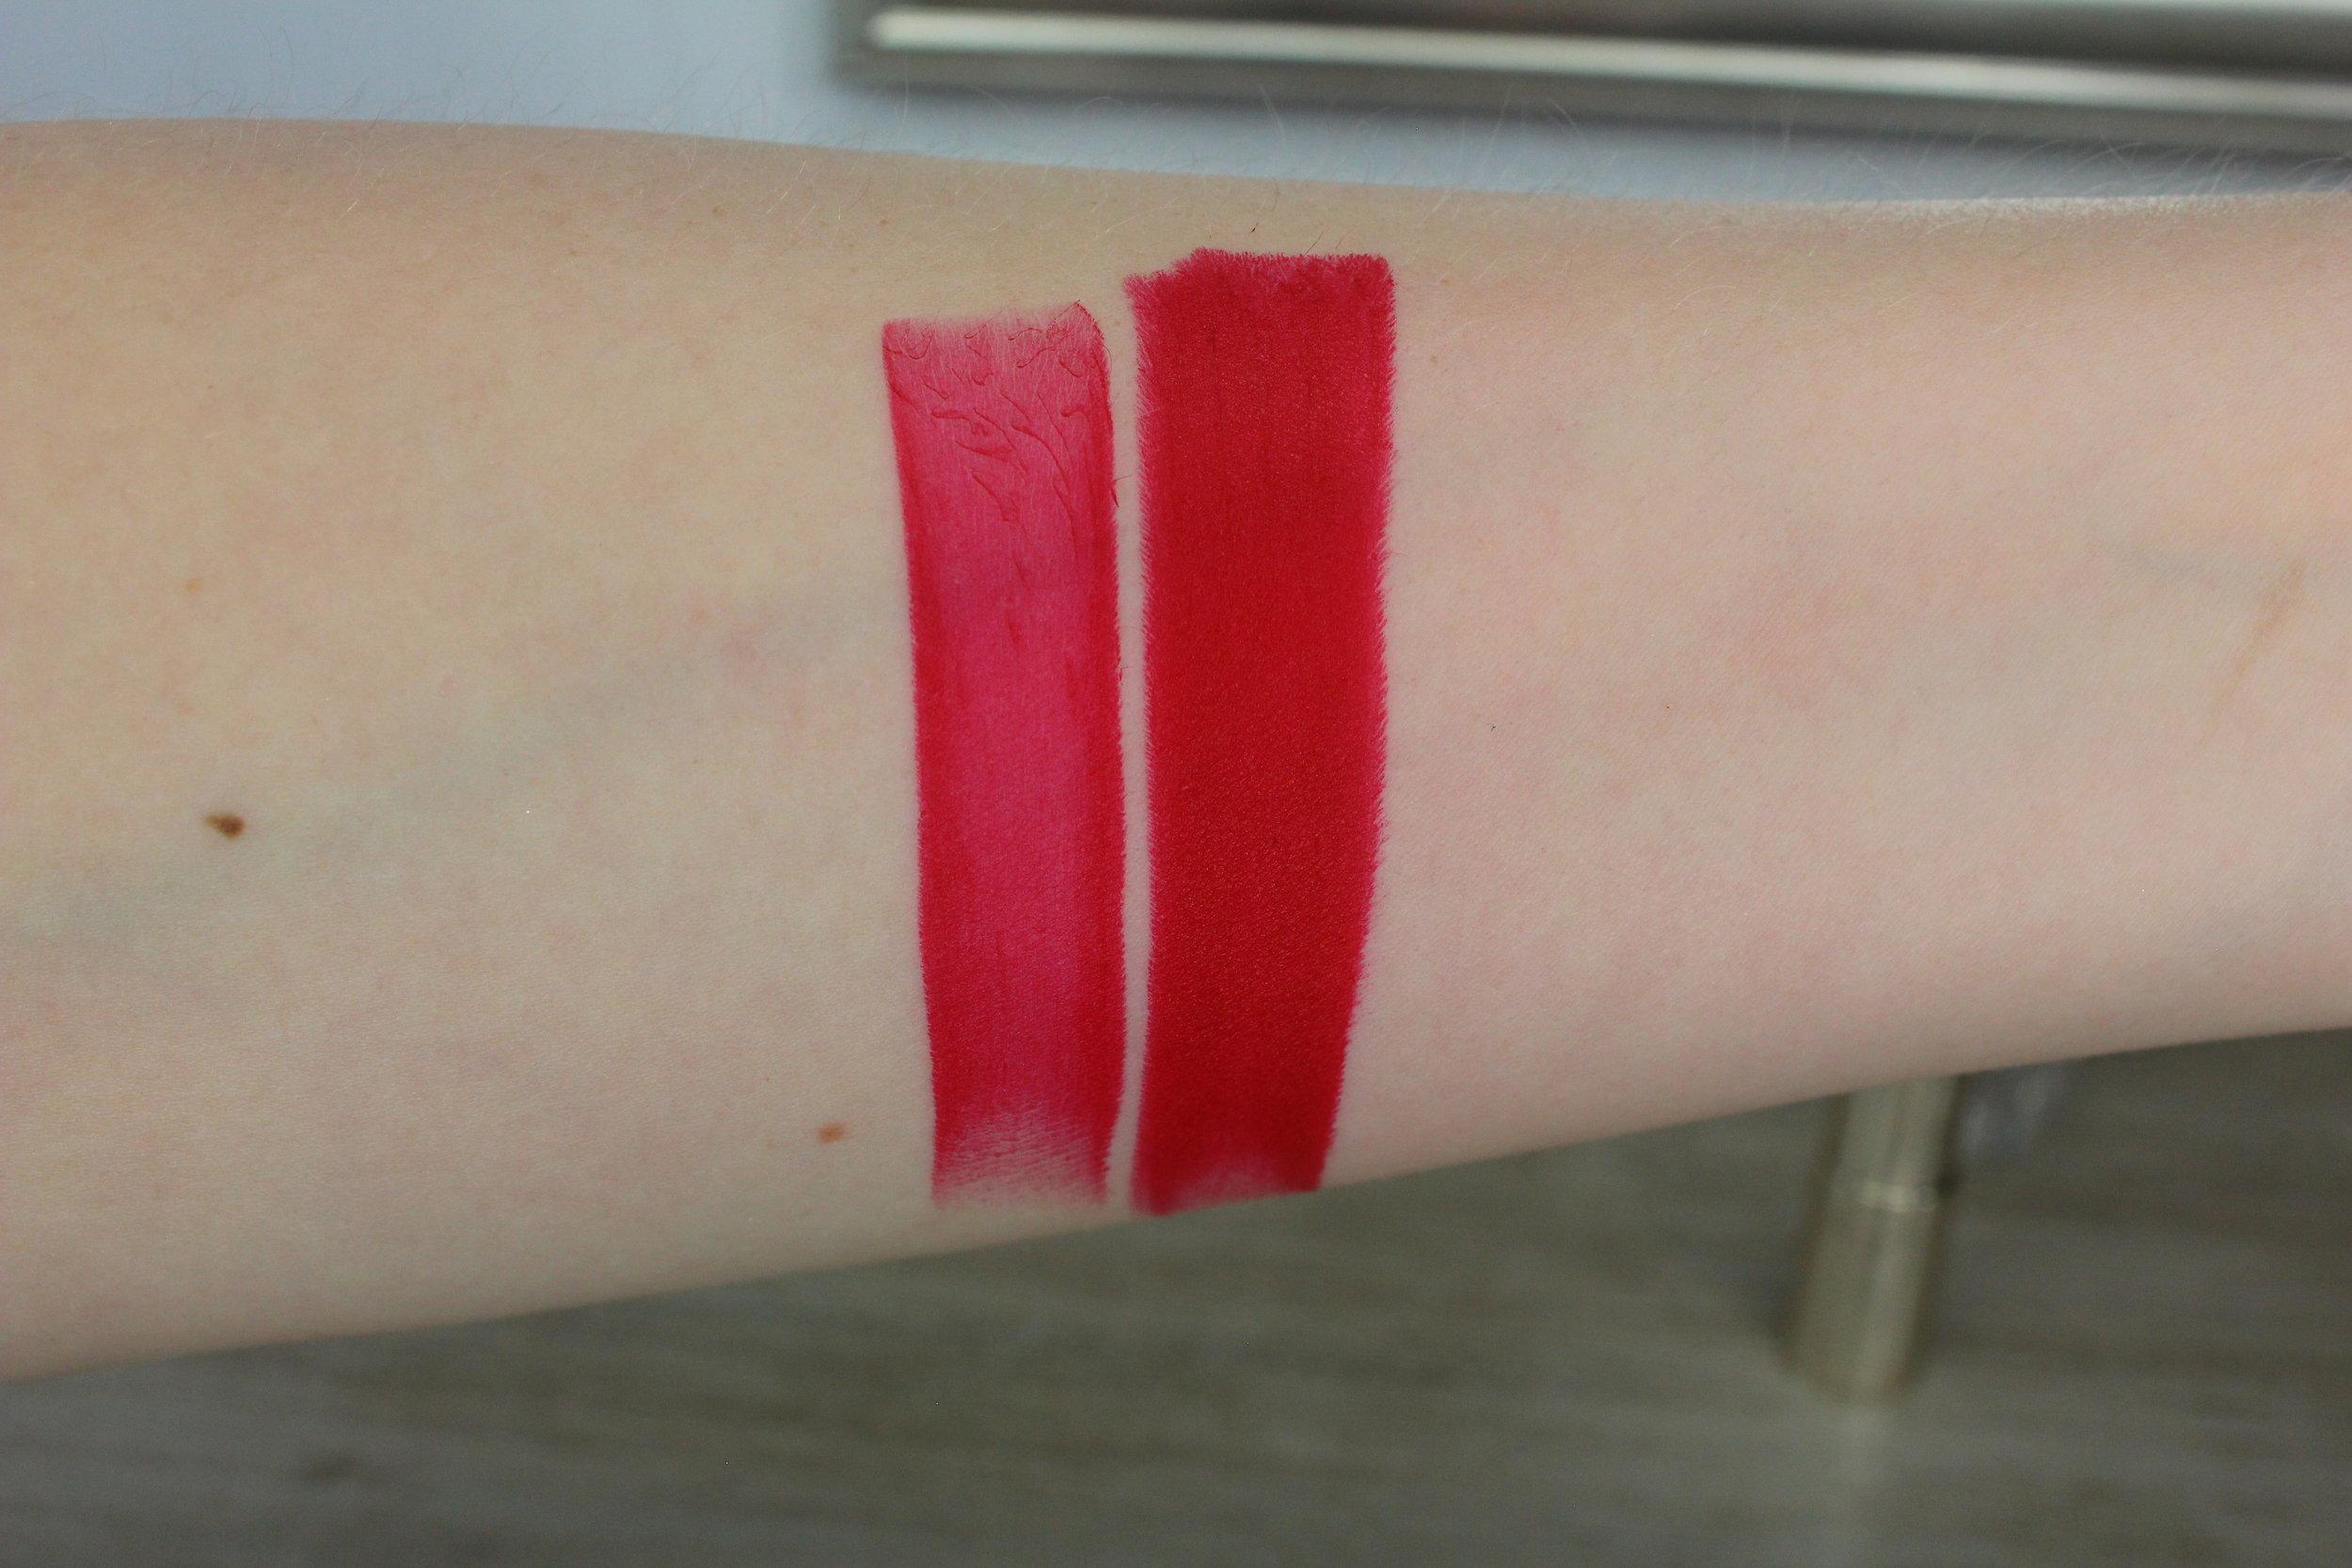 Estee Lauder Bar Red (310) swatch